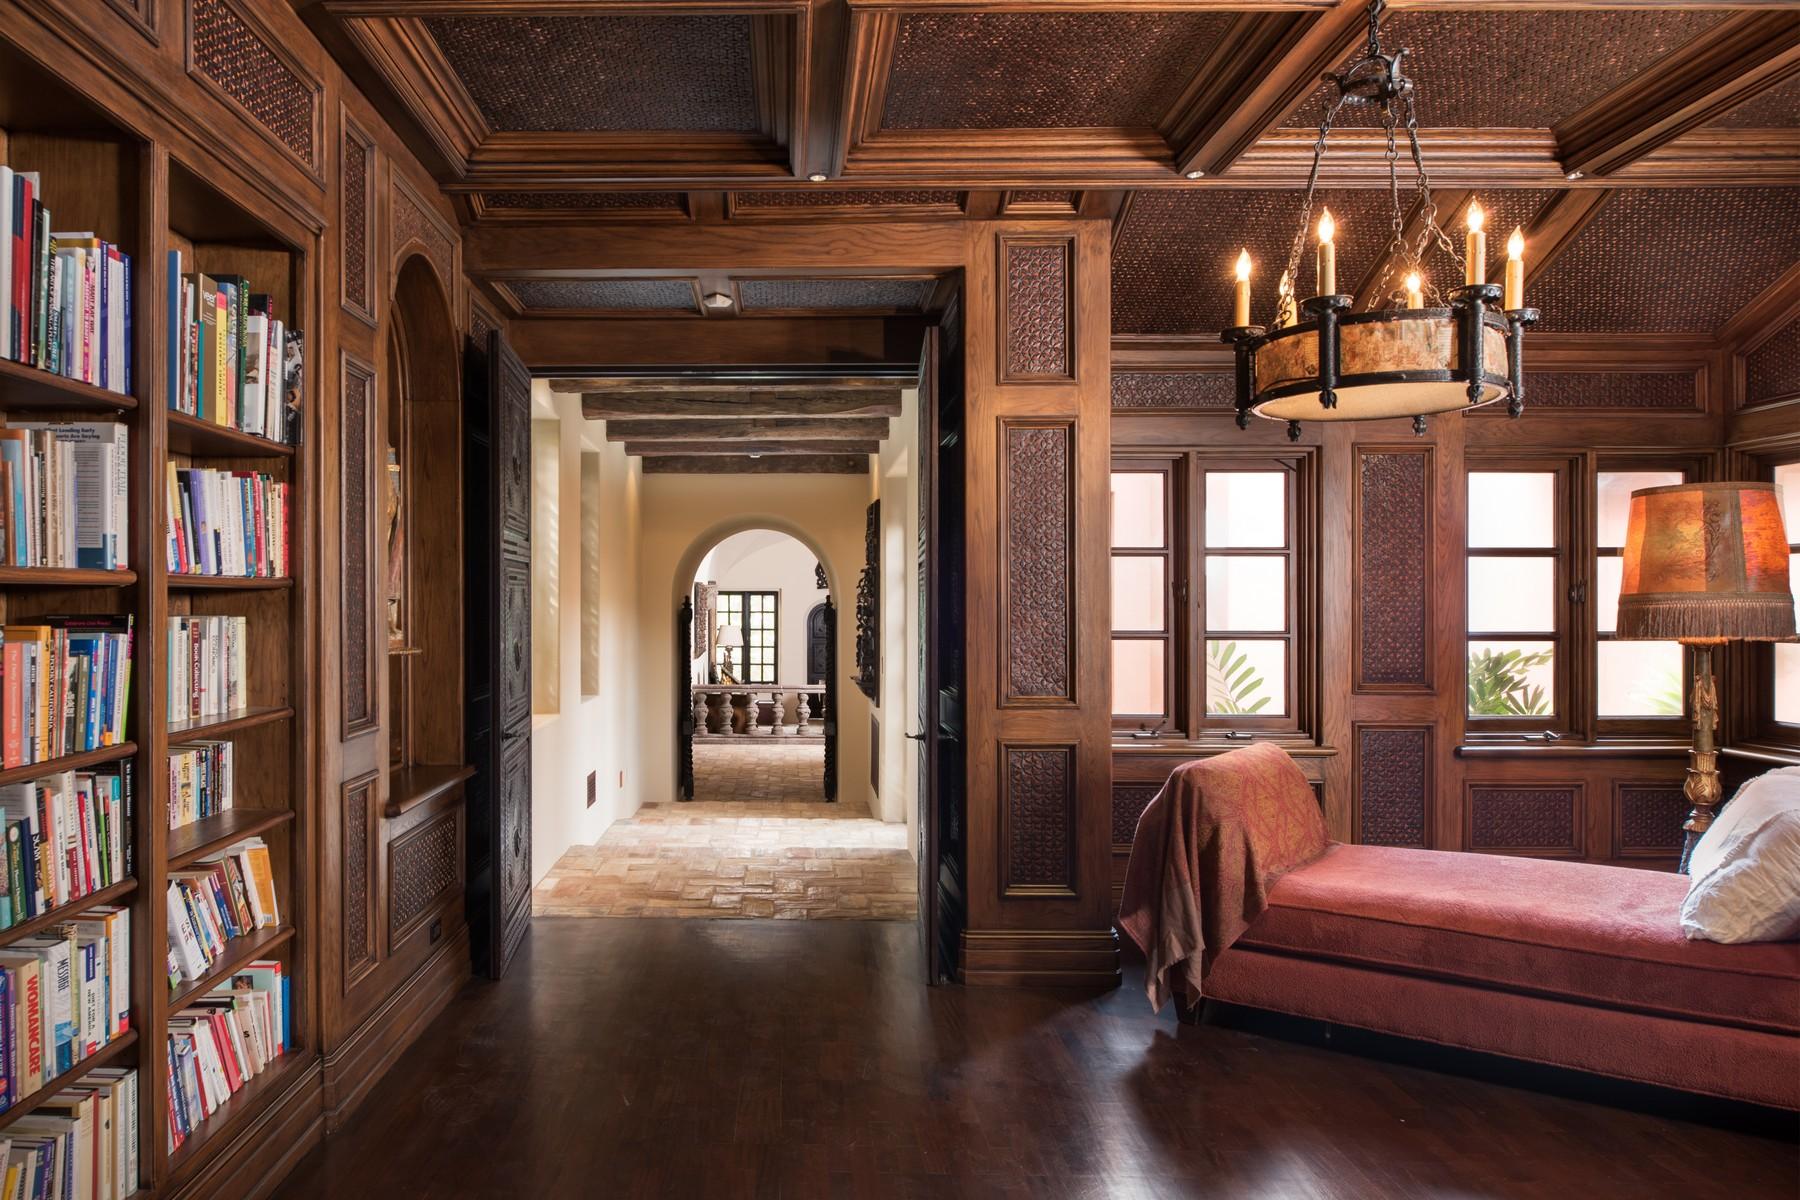 Additional photo for property listing at 17116 Paseo Hermosa  Rancho Santa Fe, California 92067 United States